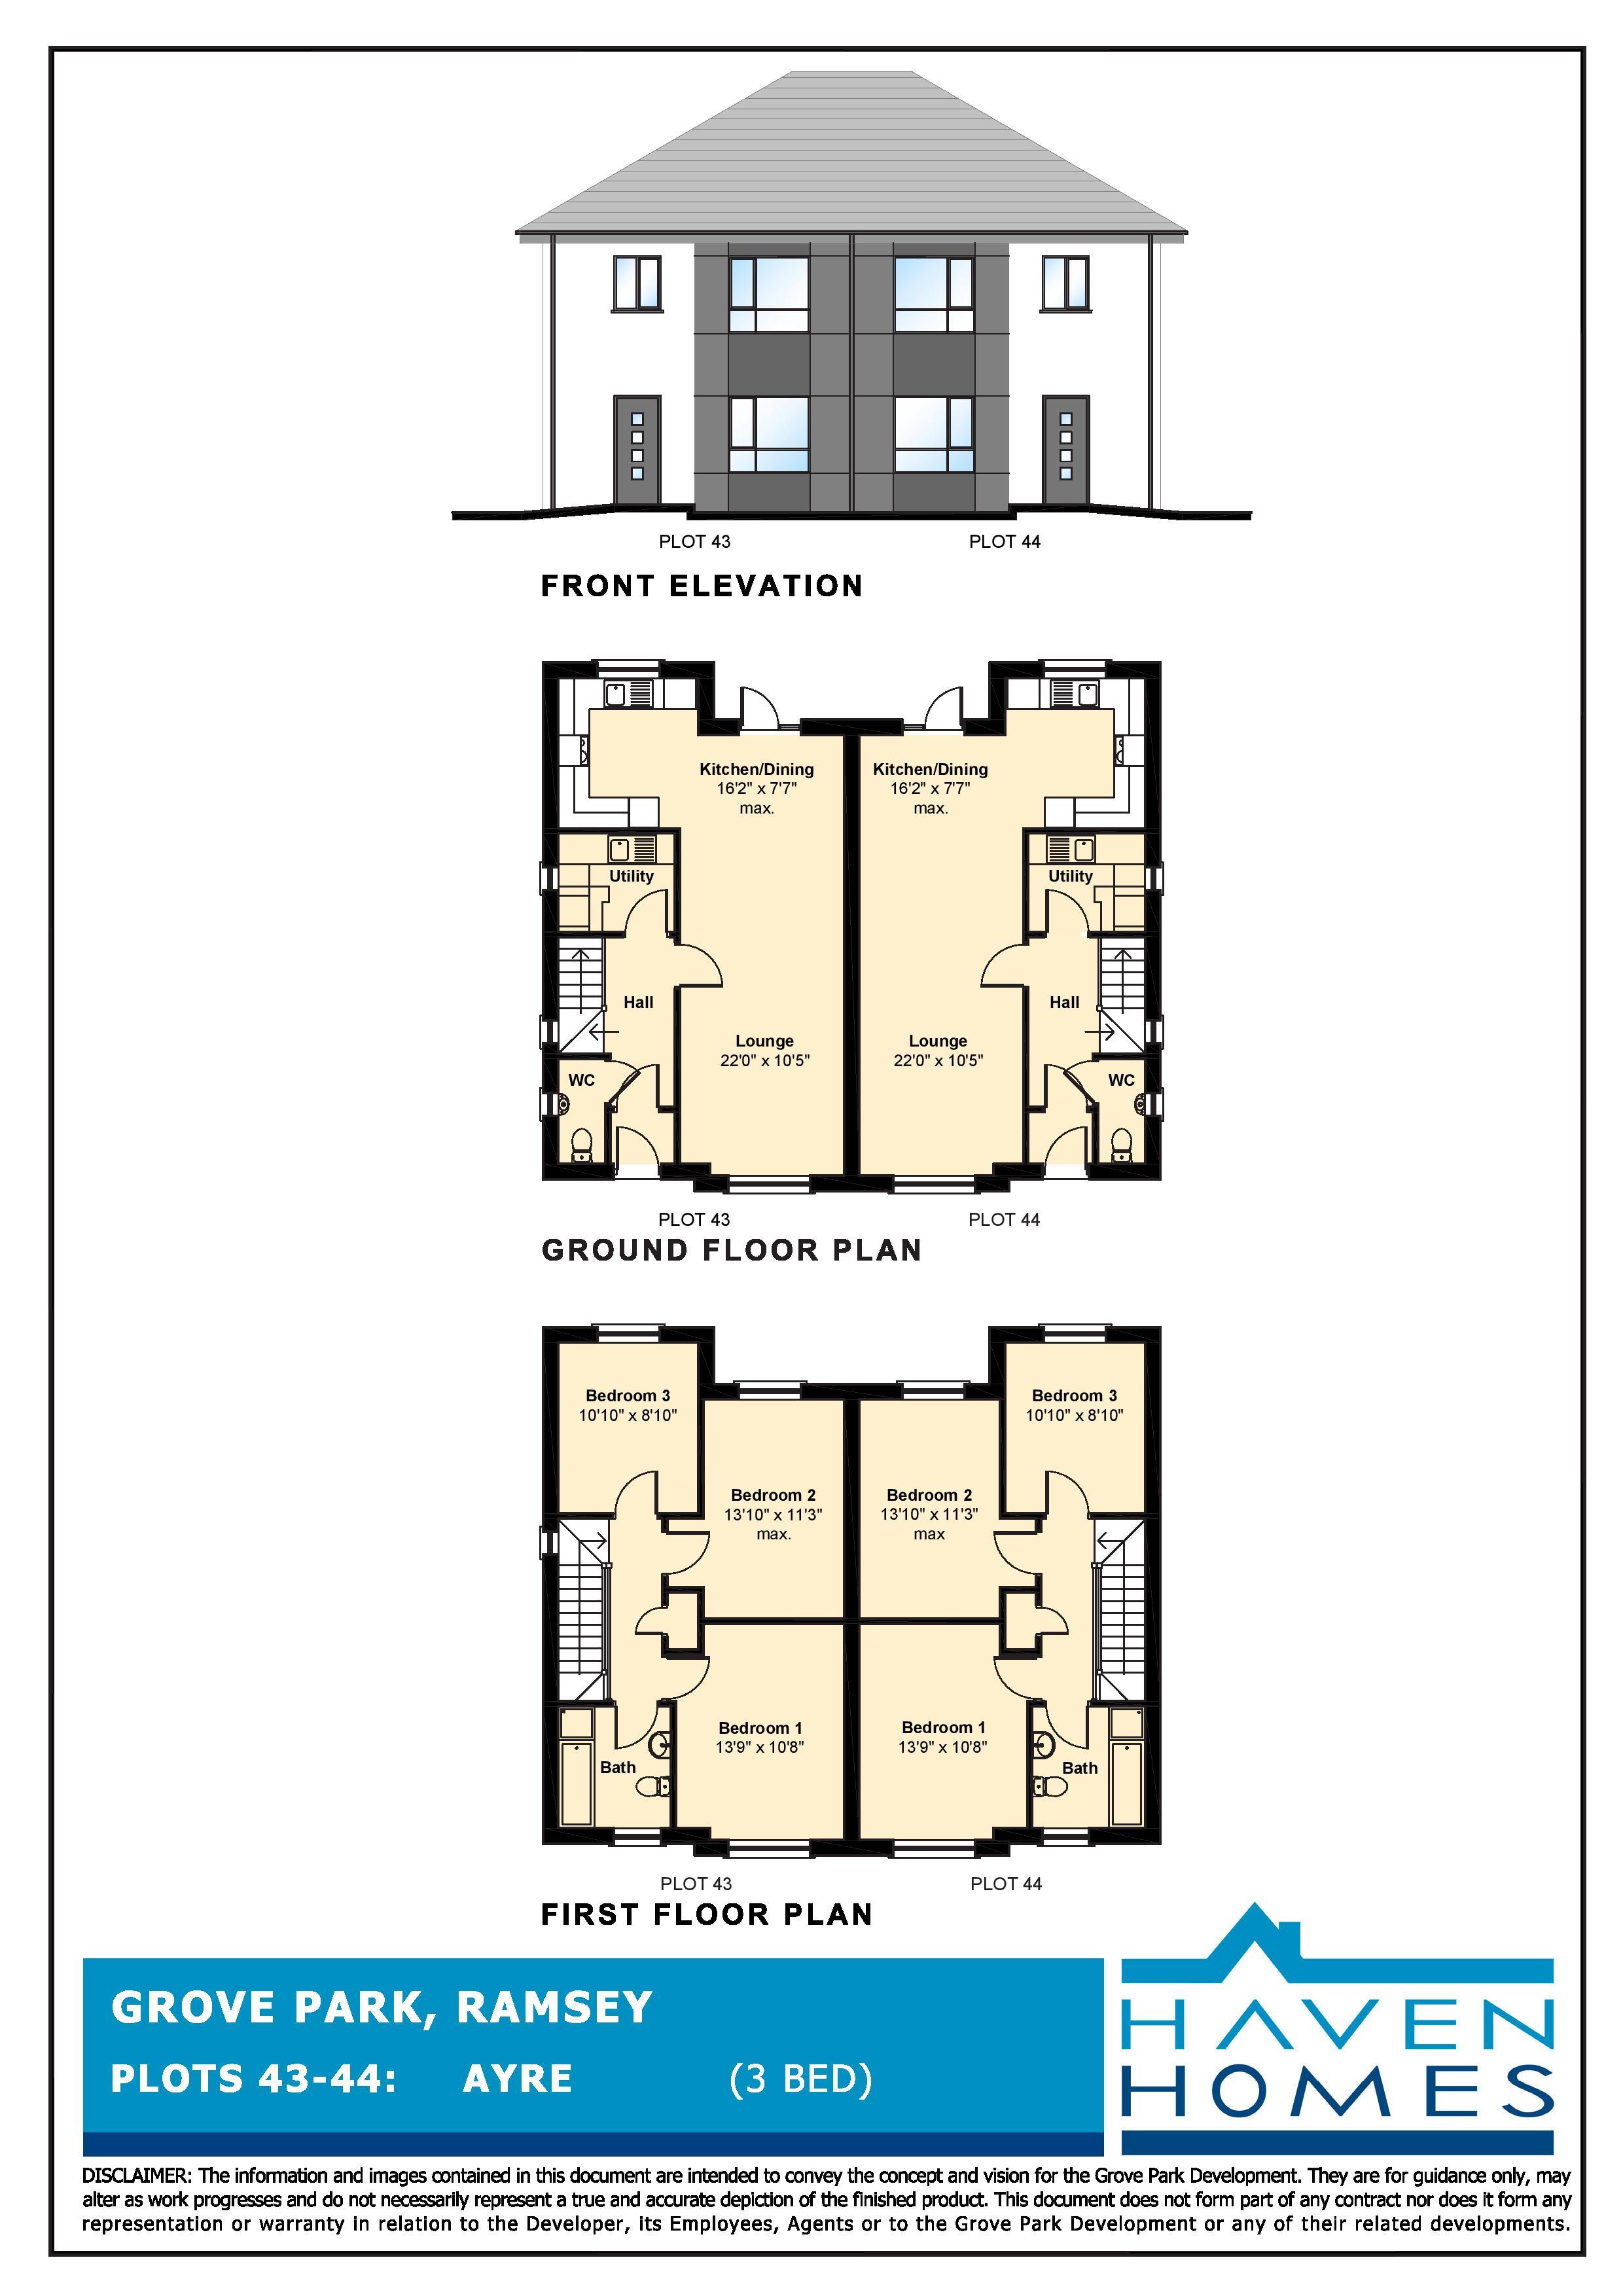 Plot 43, Grove Park, Ramsey Floorplan